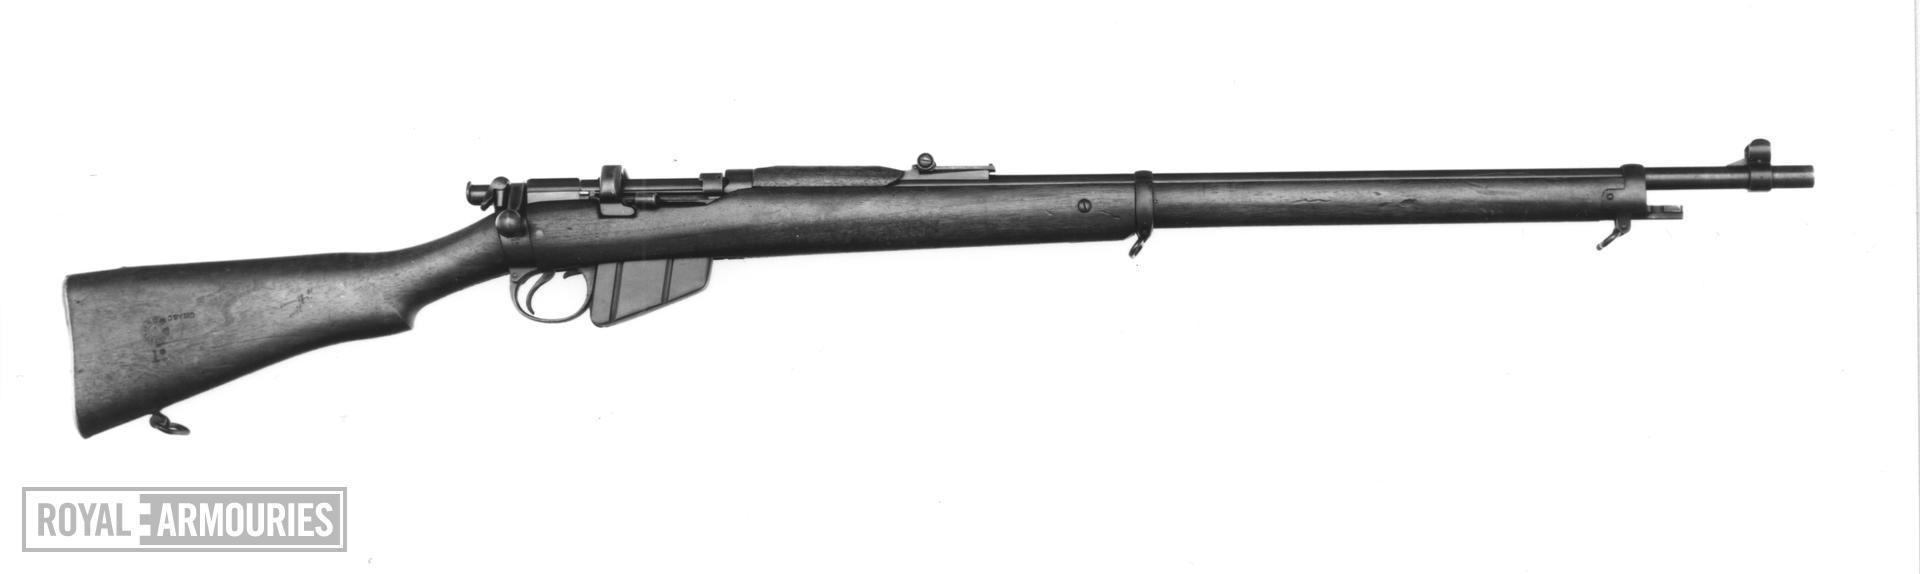 Centrefire bolt-action magazine rifle - Lee-Enfield Mk. I